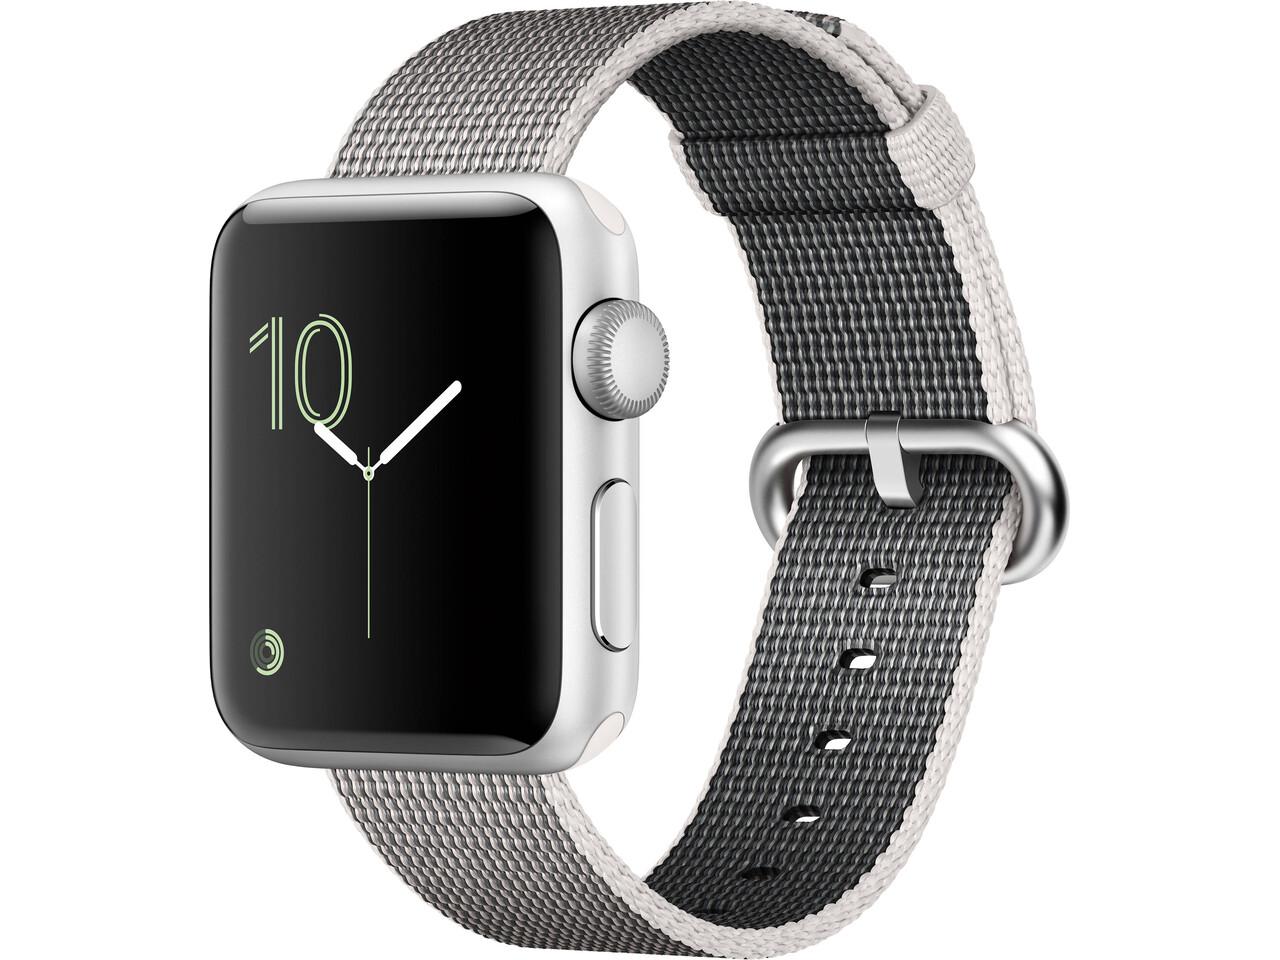 apple watch series 2 38mm silver aluminum white woven nylon